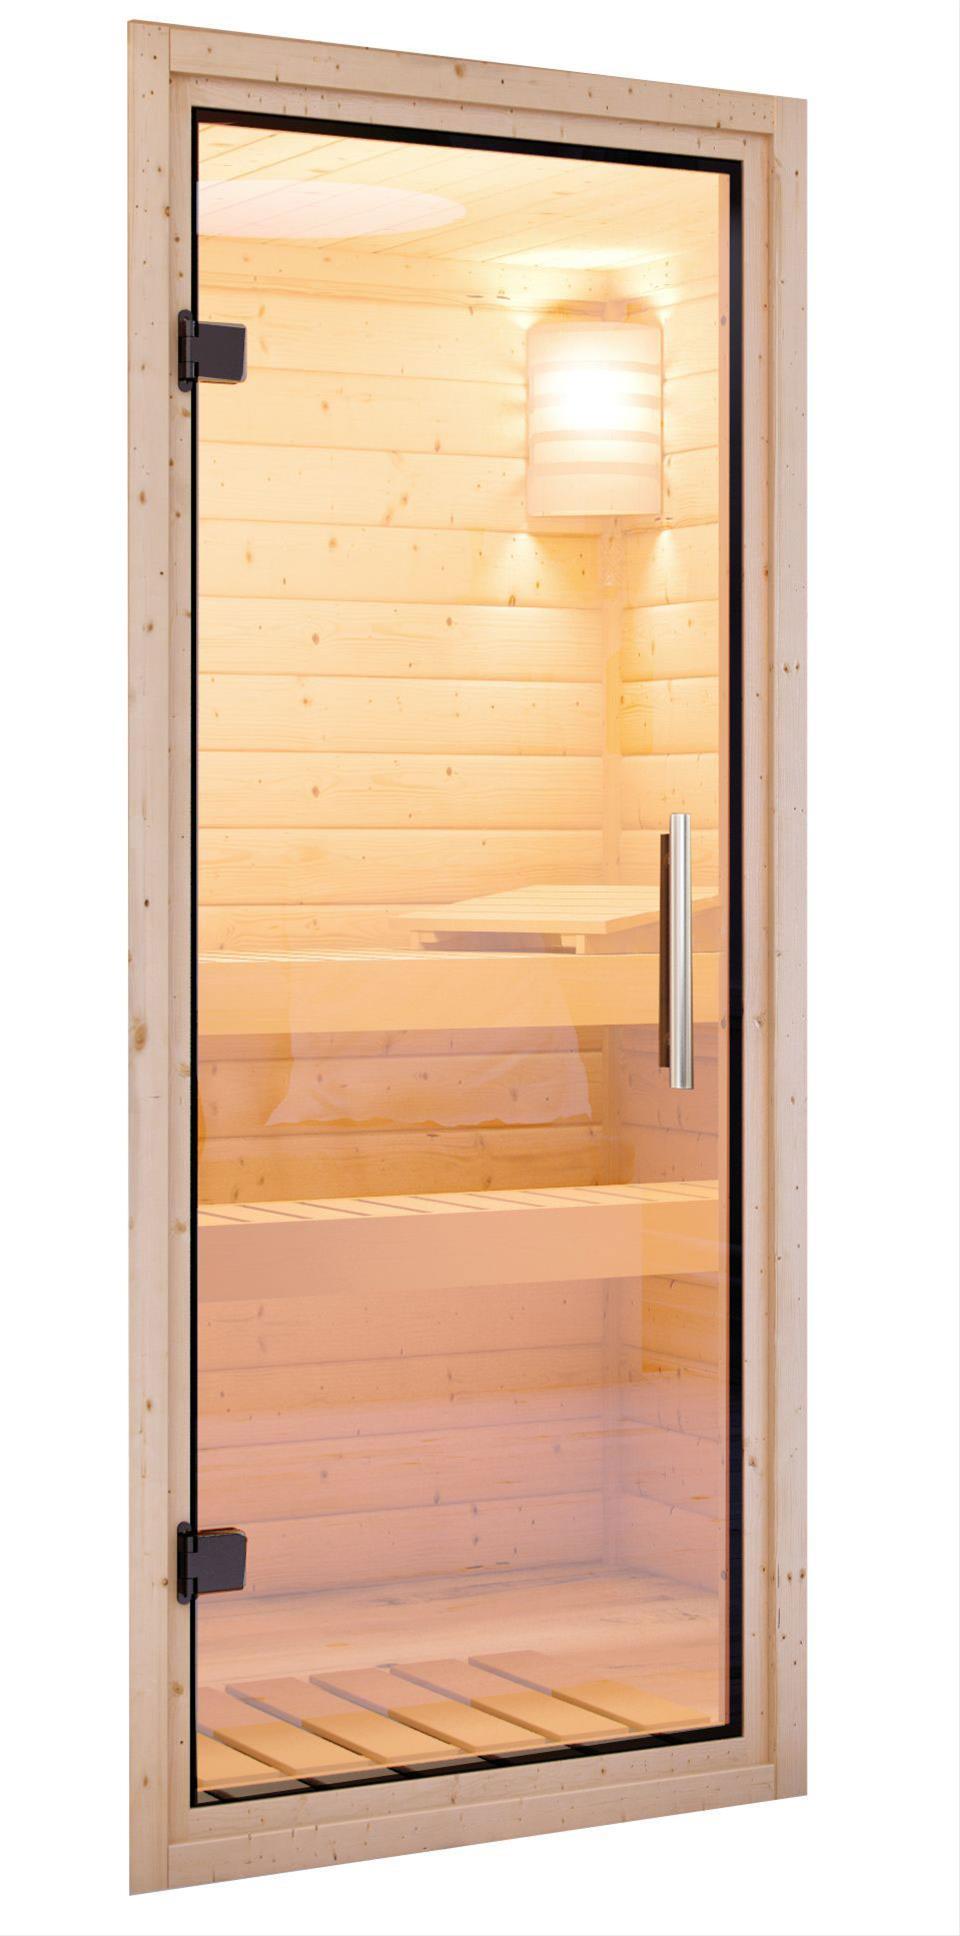 Woodfeeling Sauna Karla 38mm Ofen Bio 9kW Tür Klarglas Bild 6